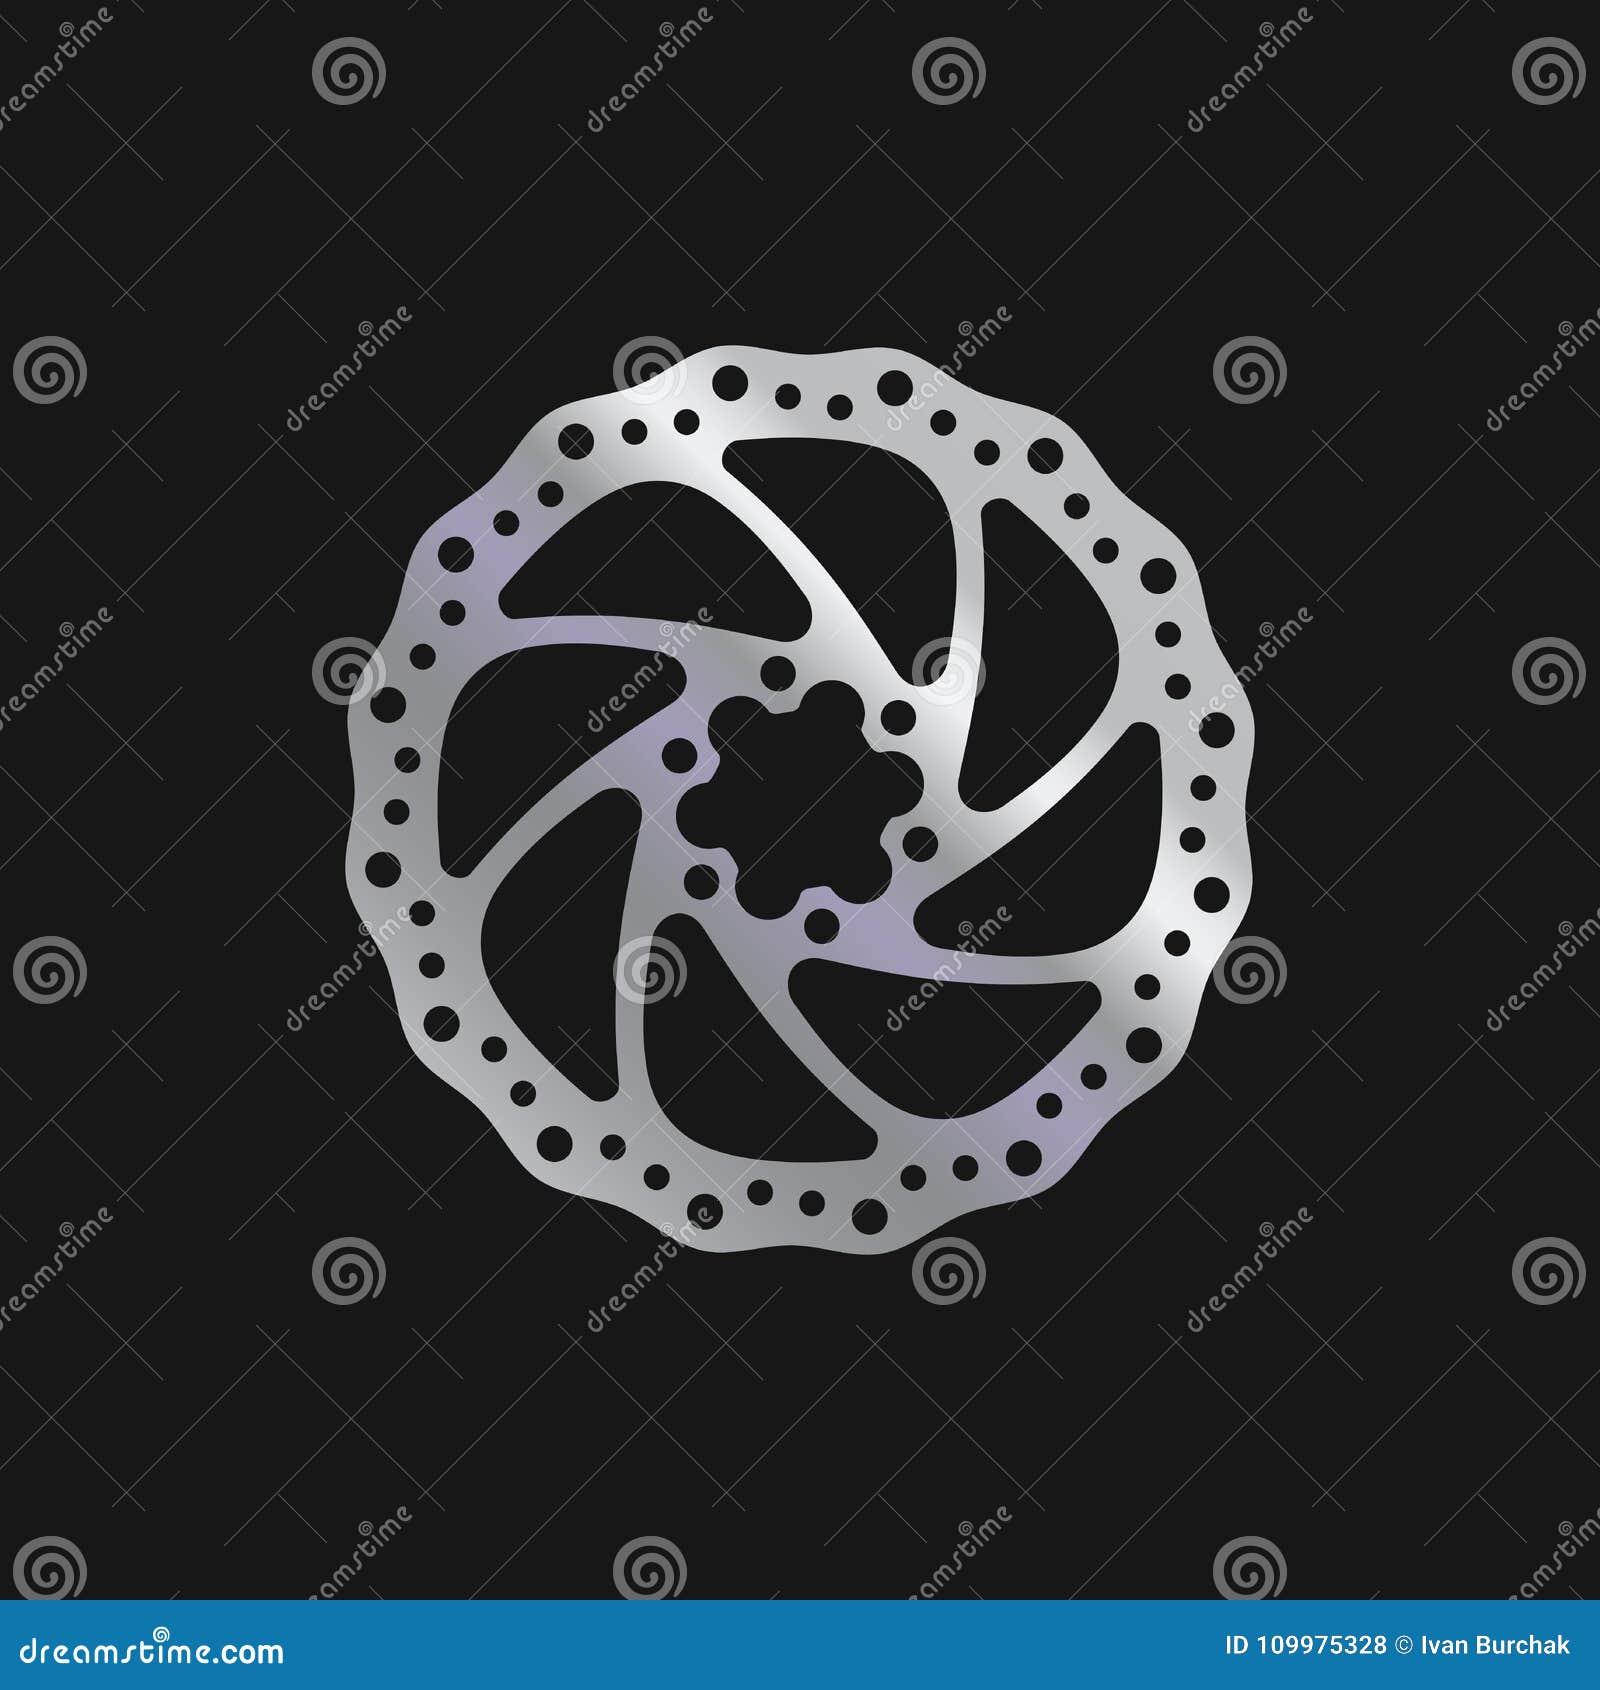 MTB Bike, Bicycle Brake Disc. Realistic Vector Illustration